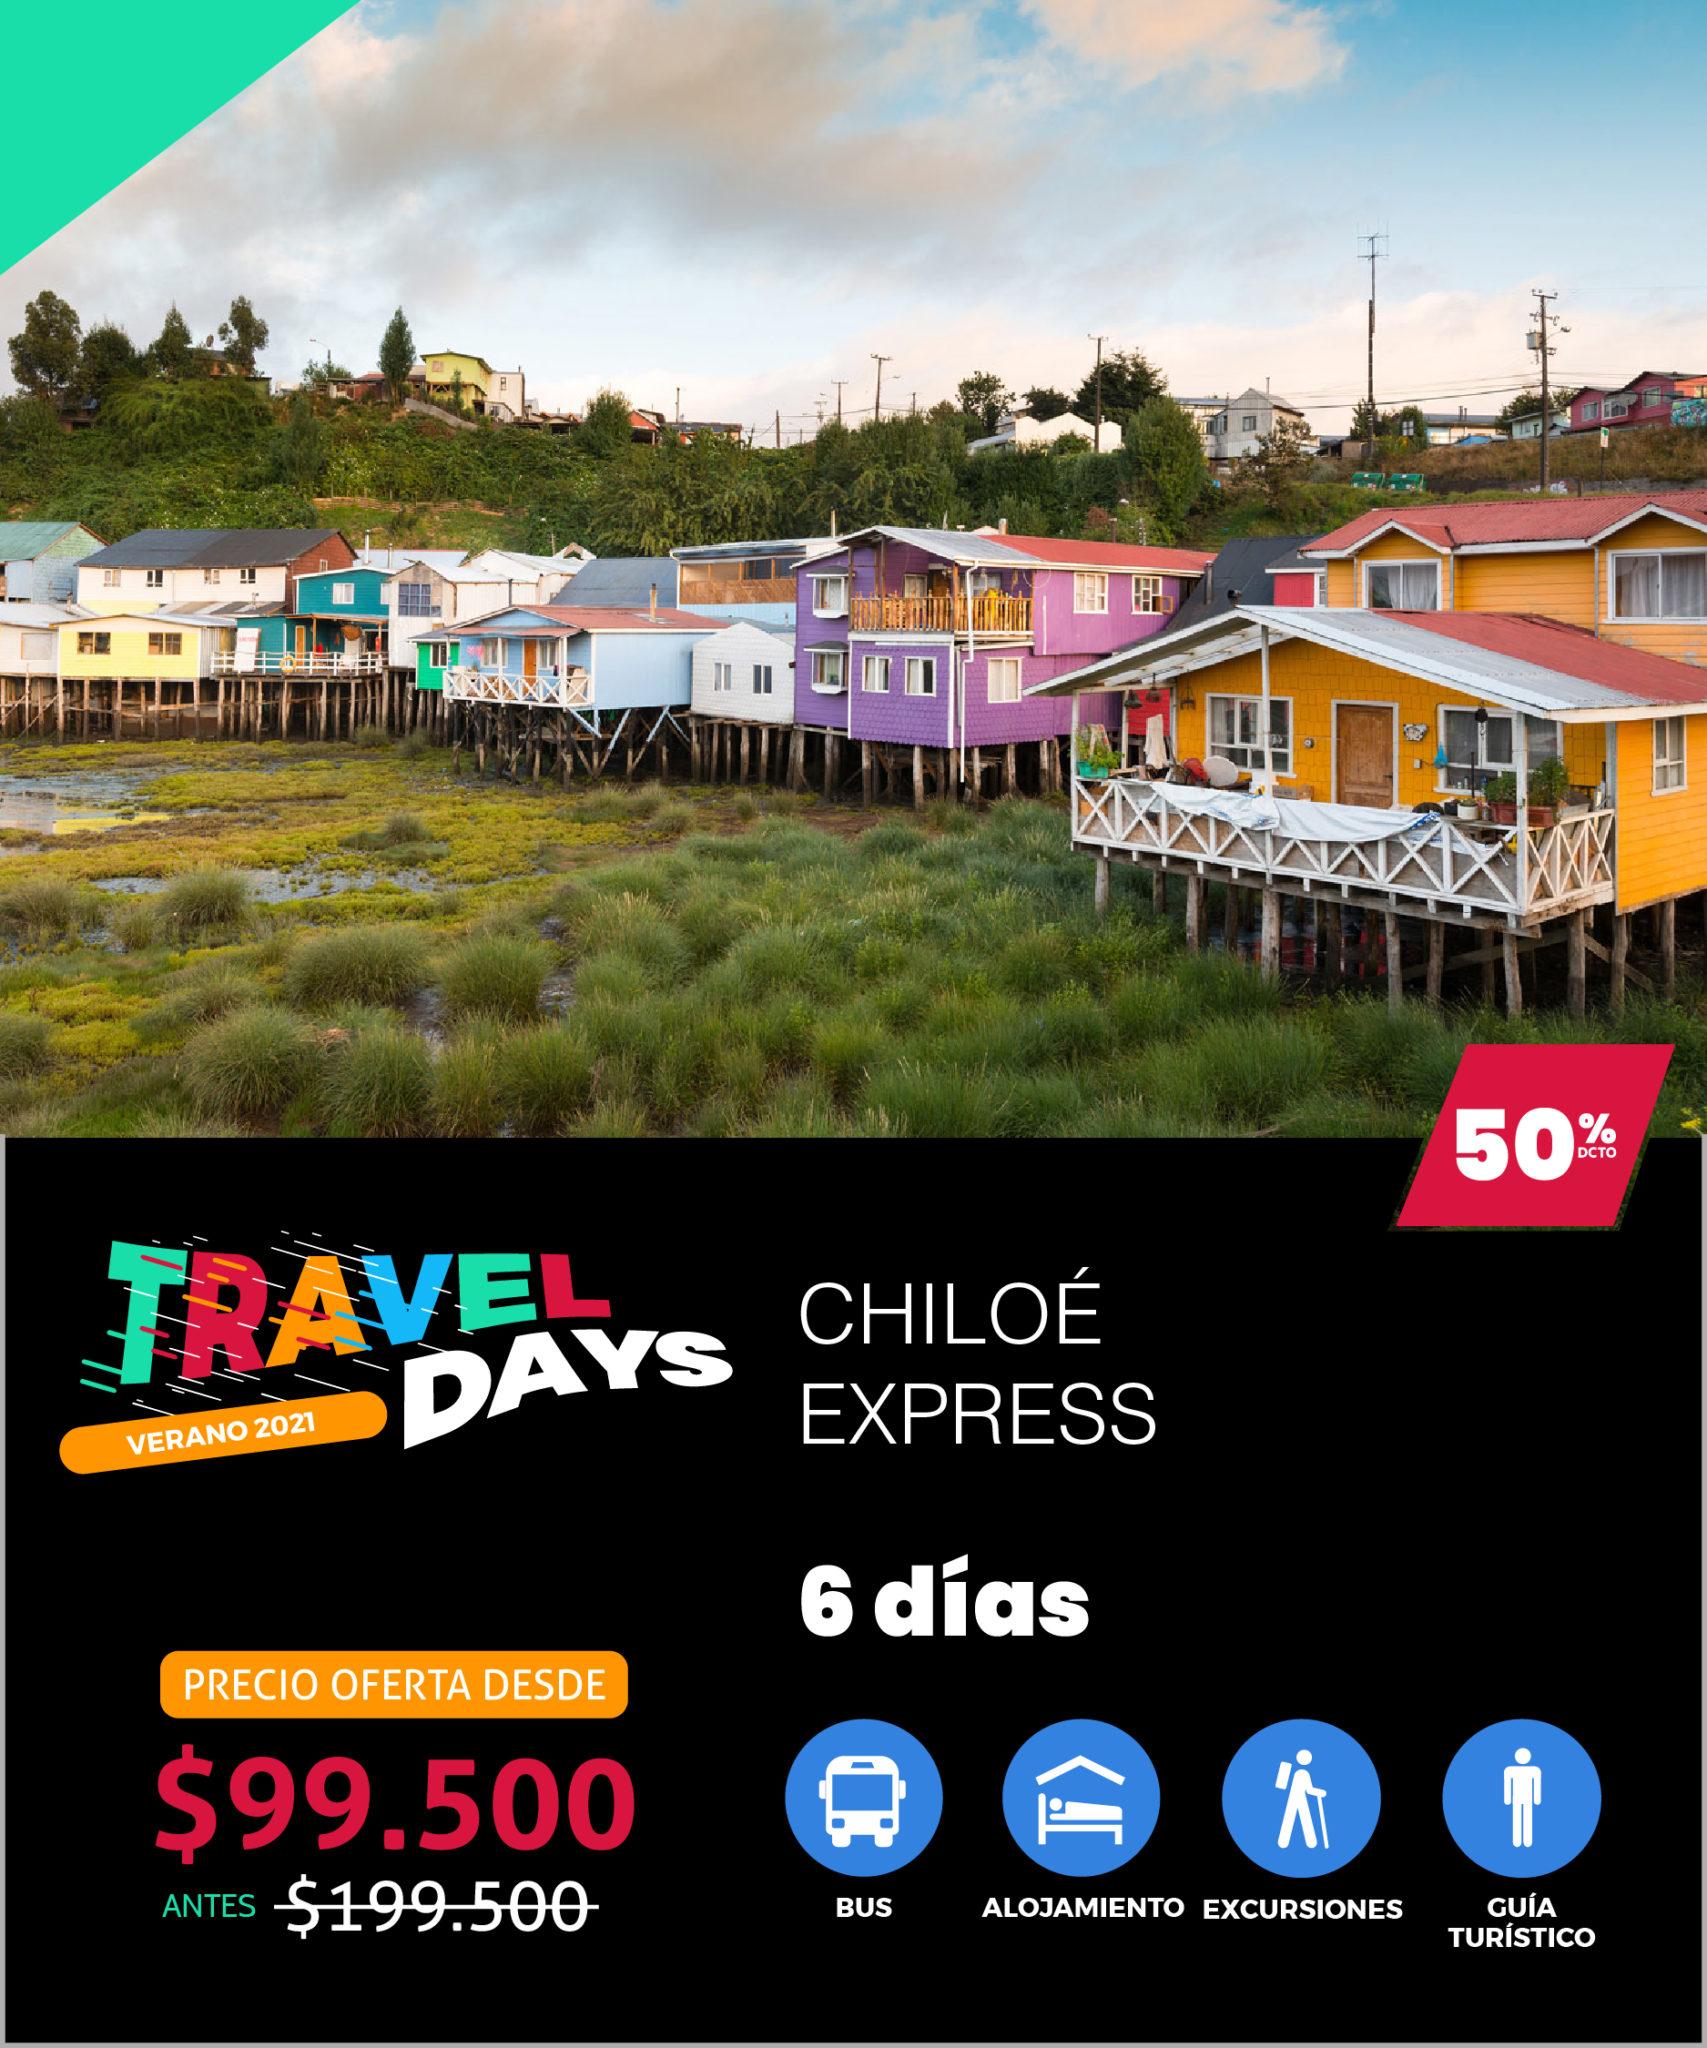 CHILOÉ EXPRESS